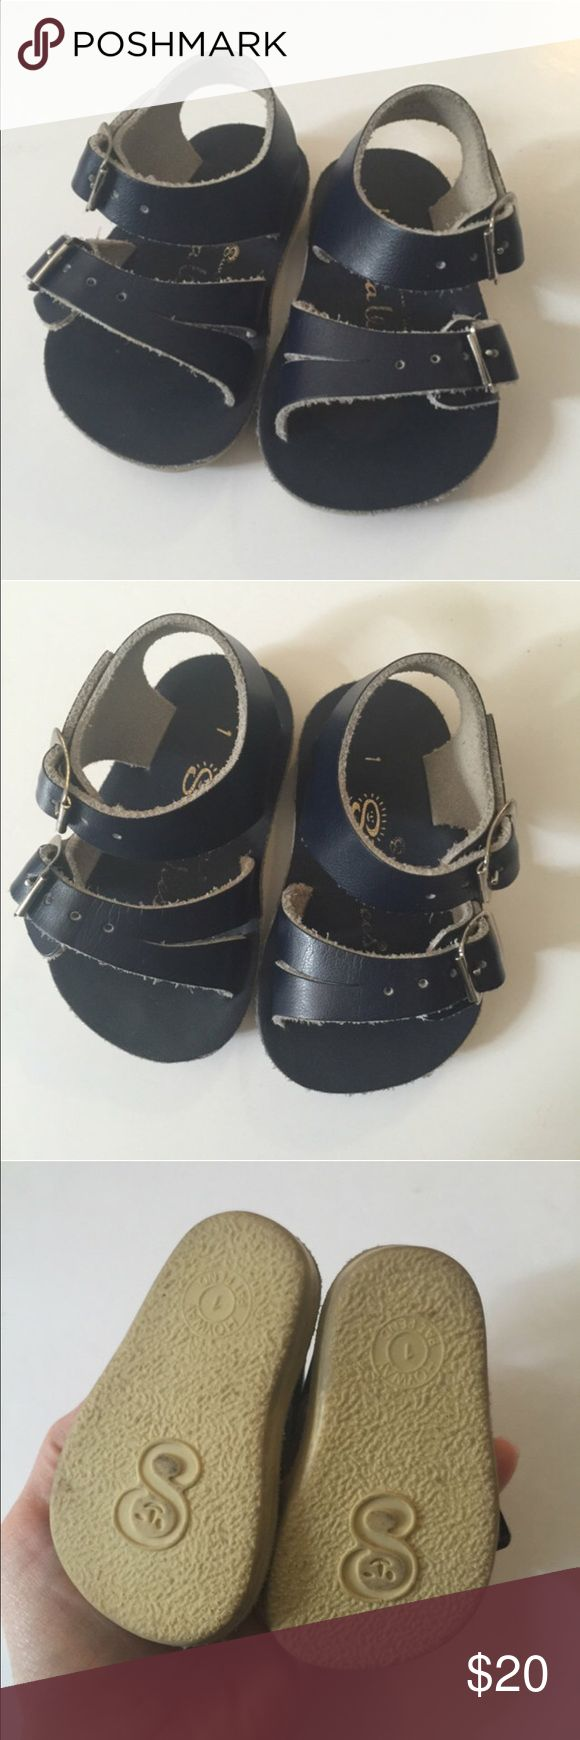 Salt water sandals Blue leather summer shoes excellent condition so adorable Salt Water Sandals by Hoy Shoes Sandals & Flip Flops